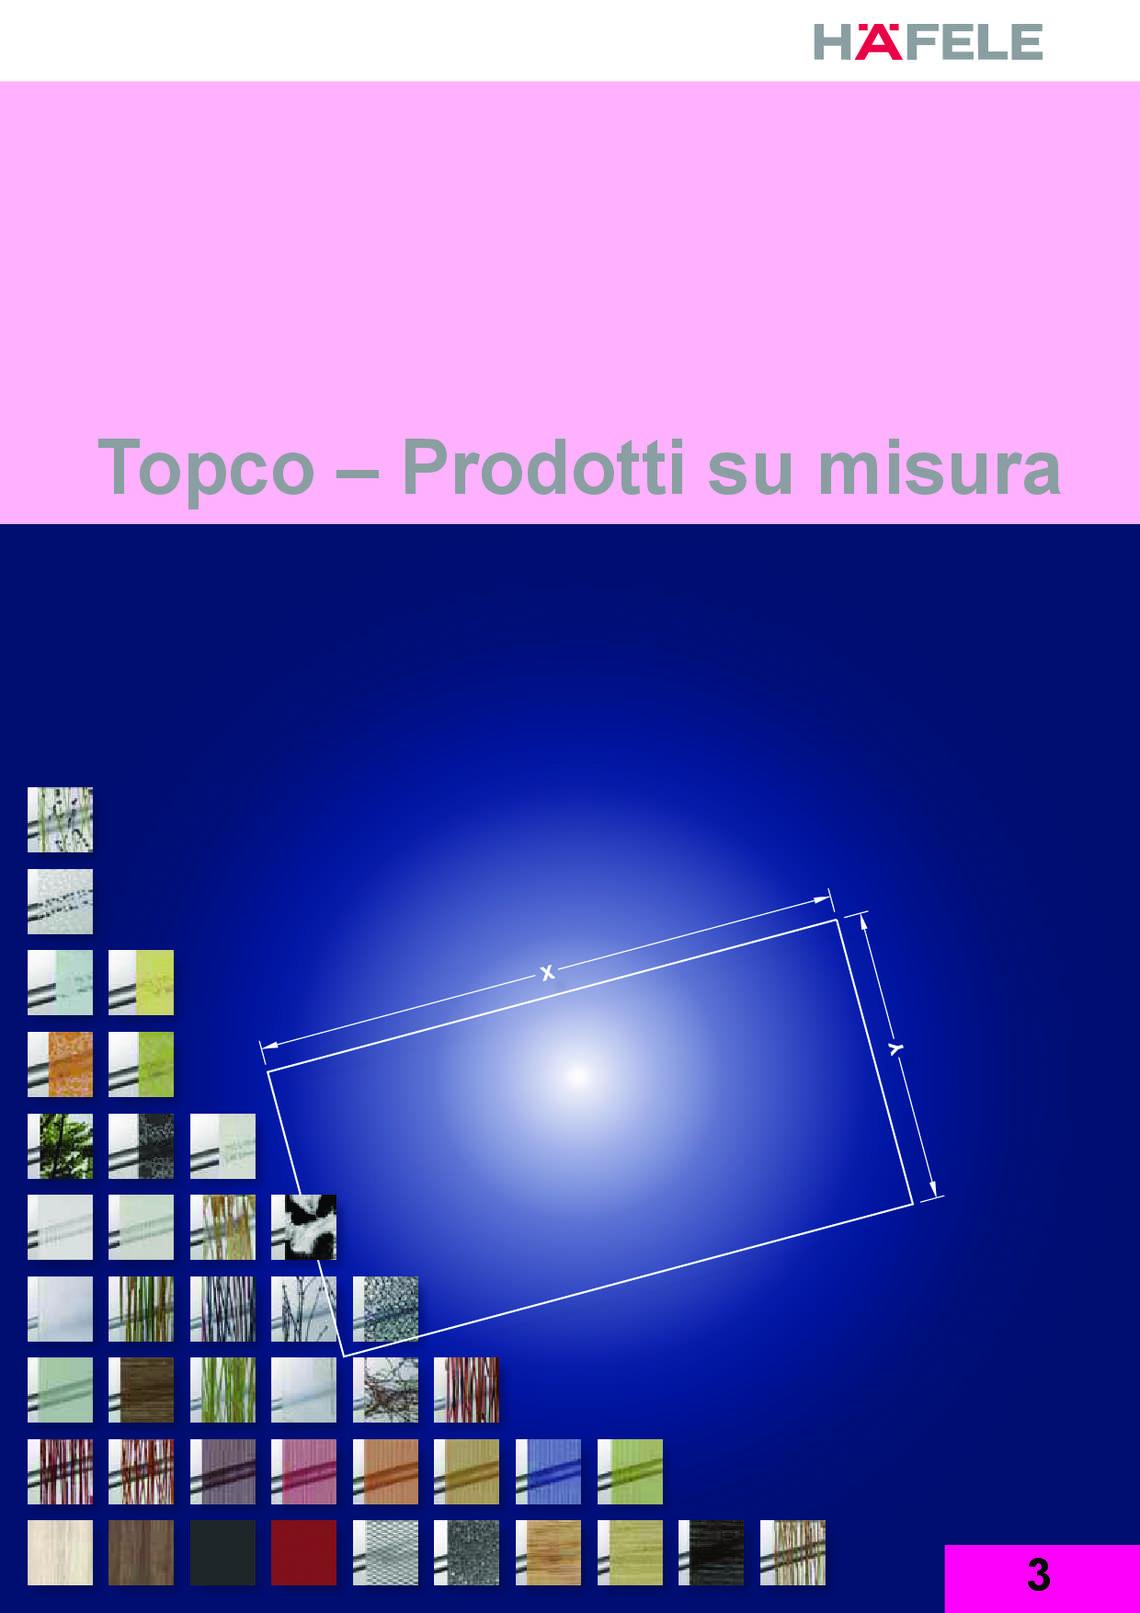 hafele-prodotti-su-misura_81_010.jpg